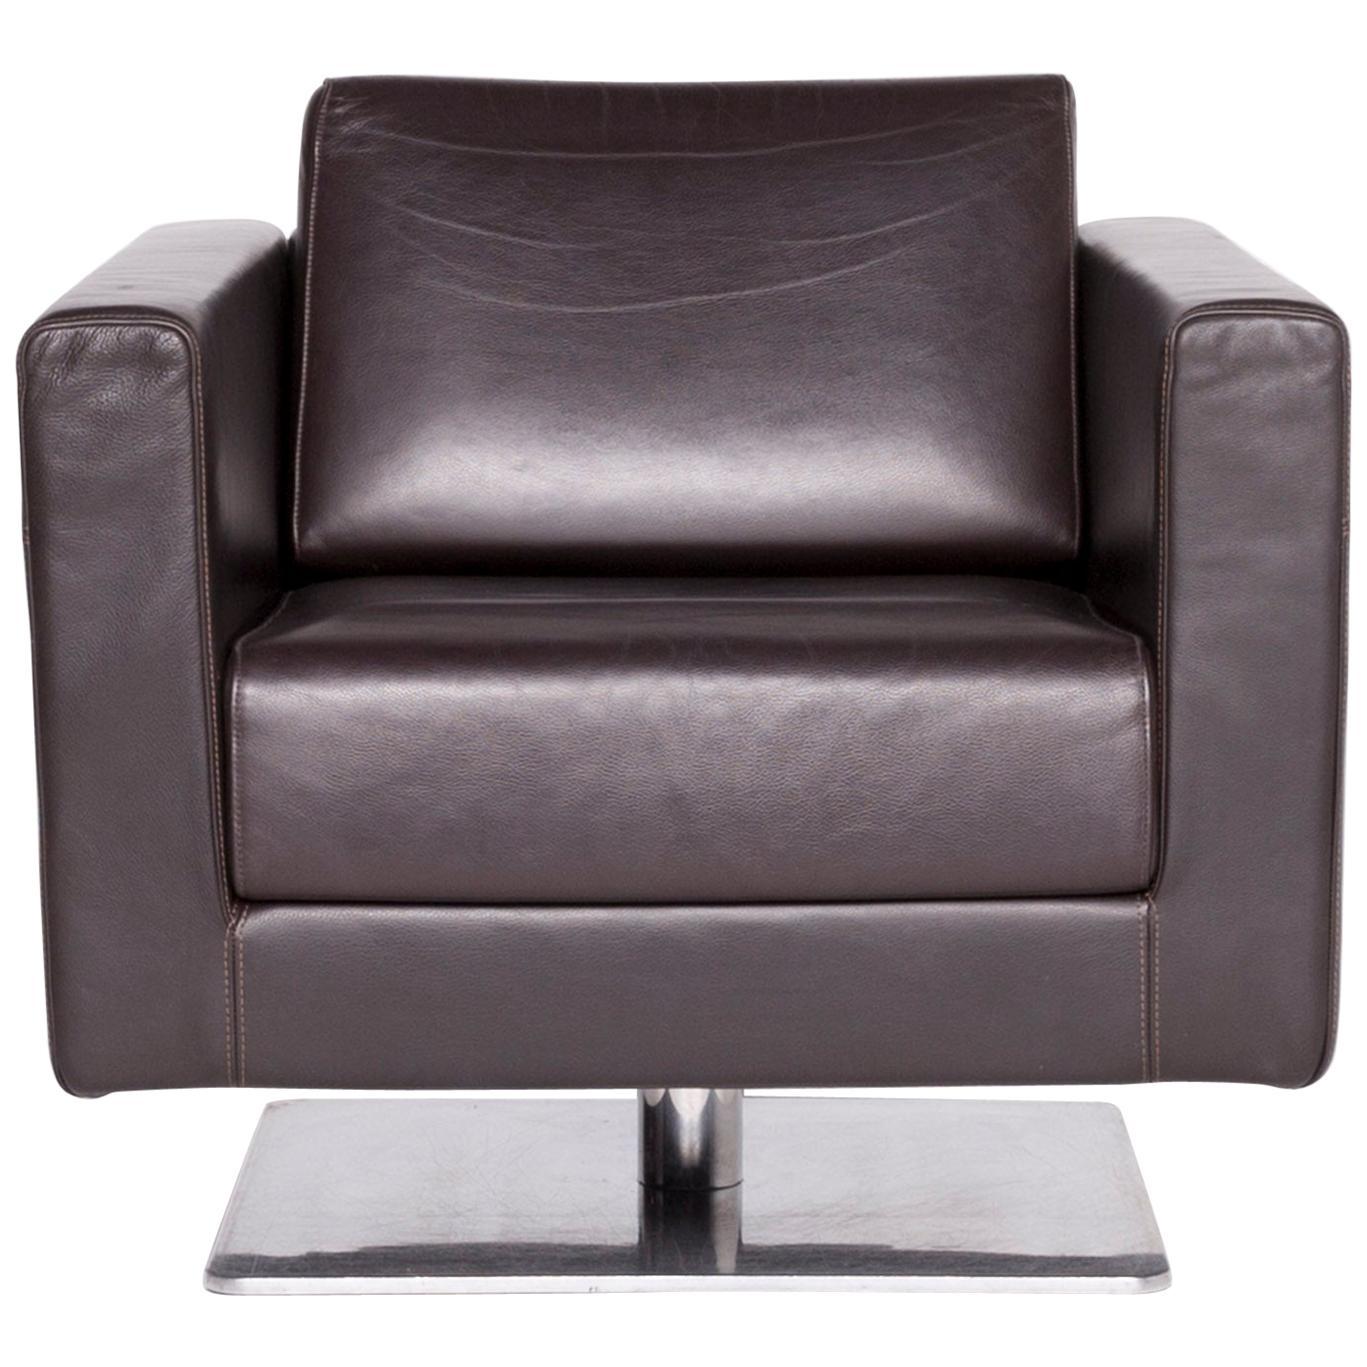 Vitra Park Armchair Designer Armchair Brown Leather Jasper Morrison Polished